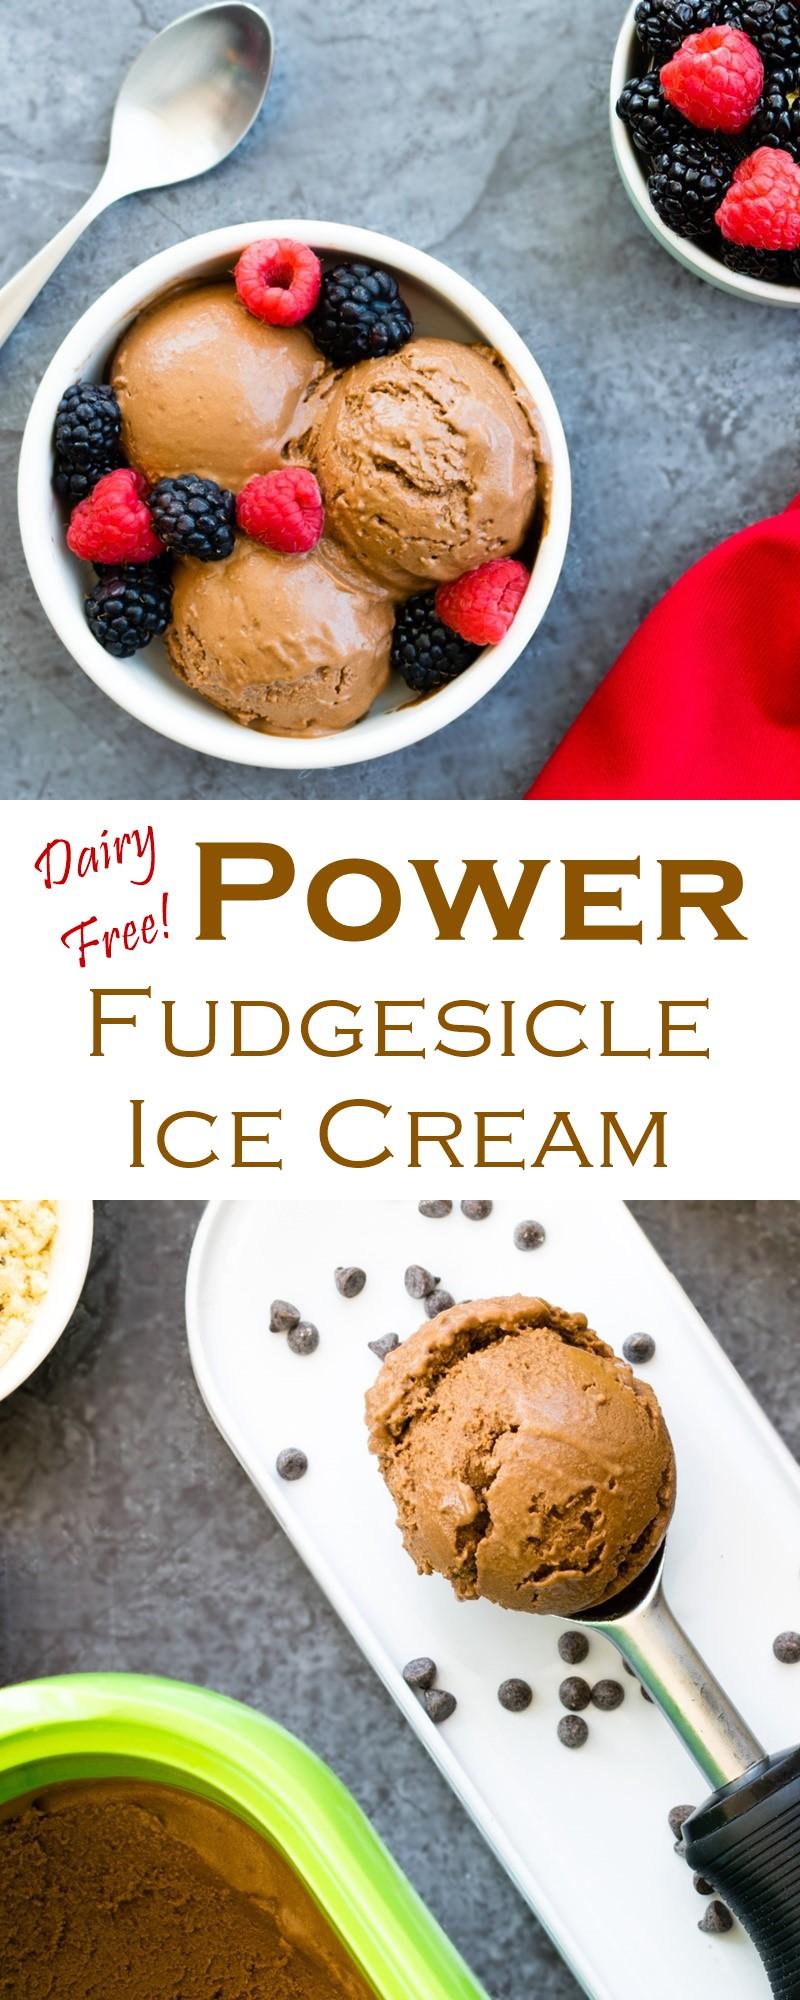 Chocolate Fudgesicle Power Ice Cream Recipe - a nutritious dairy-free, gluten-free, allergy-friendly and vegan treat